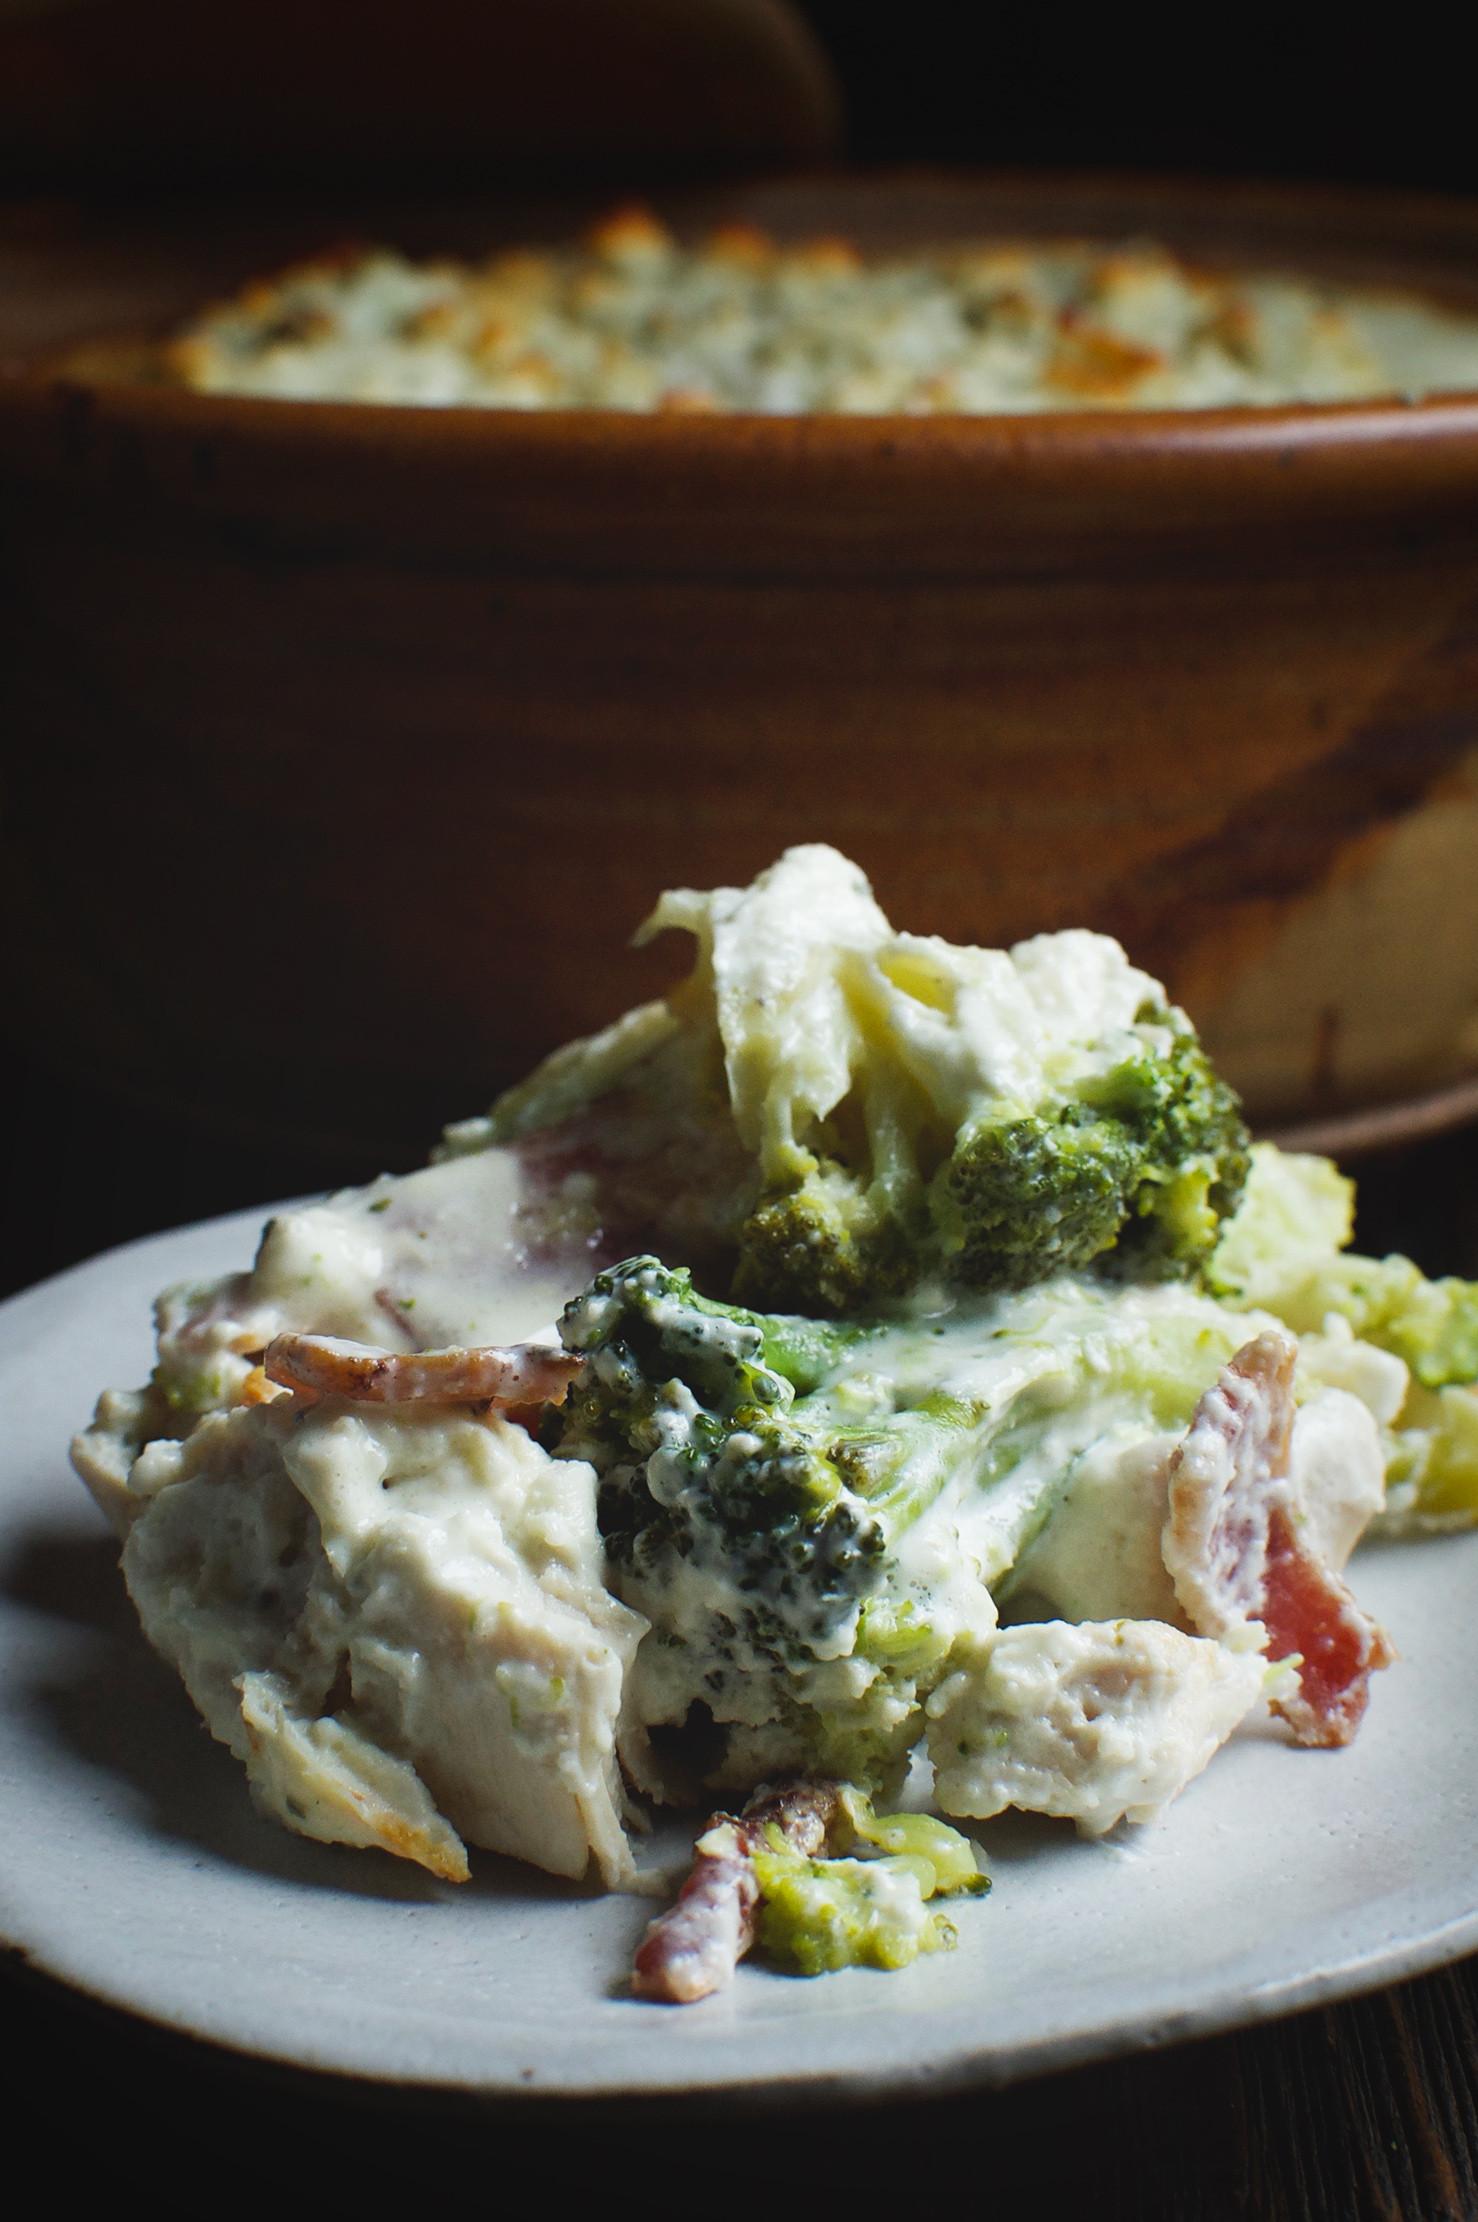 Turkey Casserole Healthy  Low Carb Leftover Turkey Casserole Recipe Simply So Healthy